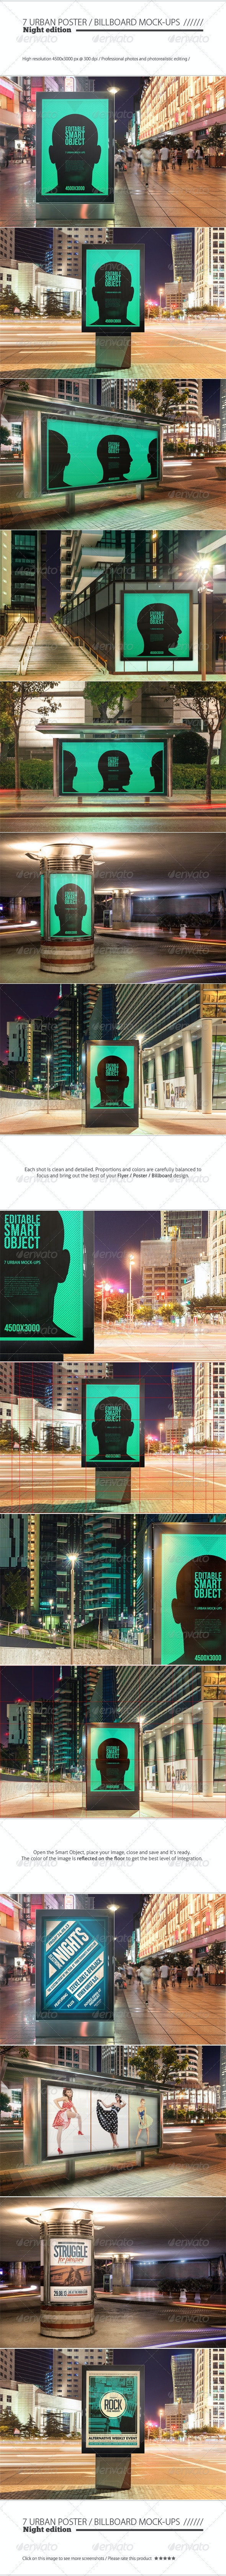 Urban Poster / Billboard Mock-ups - Night Edition - Posters Print